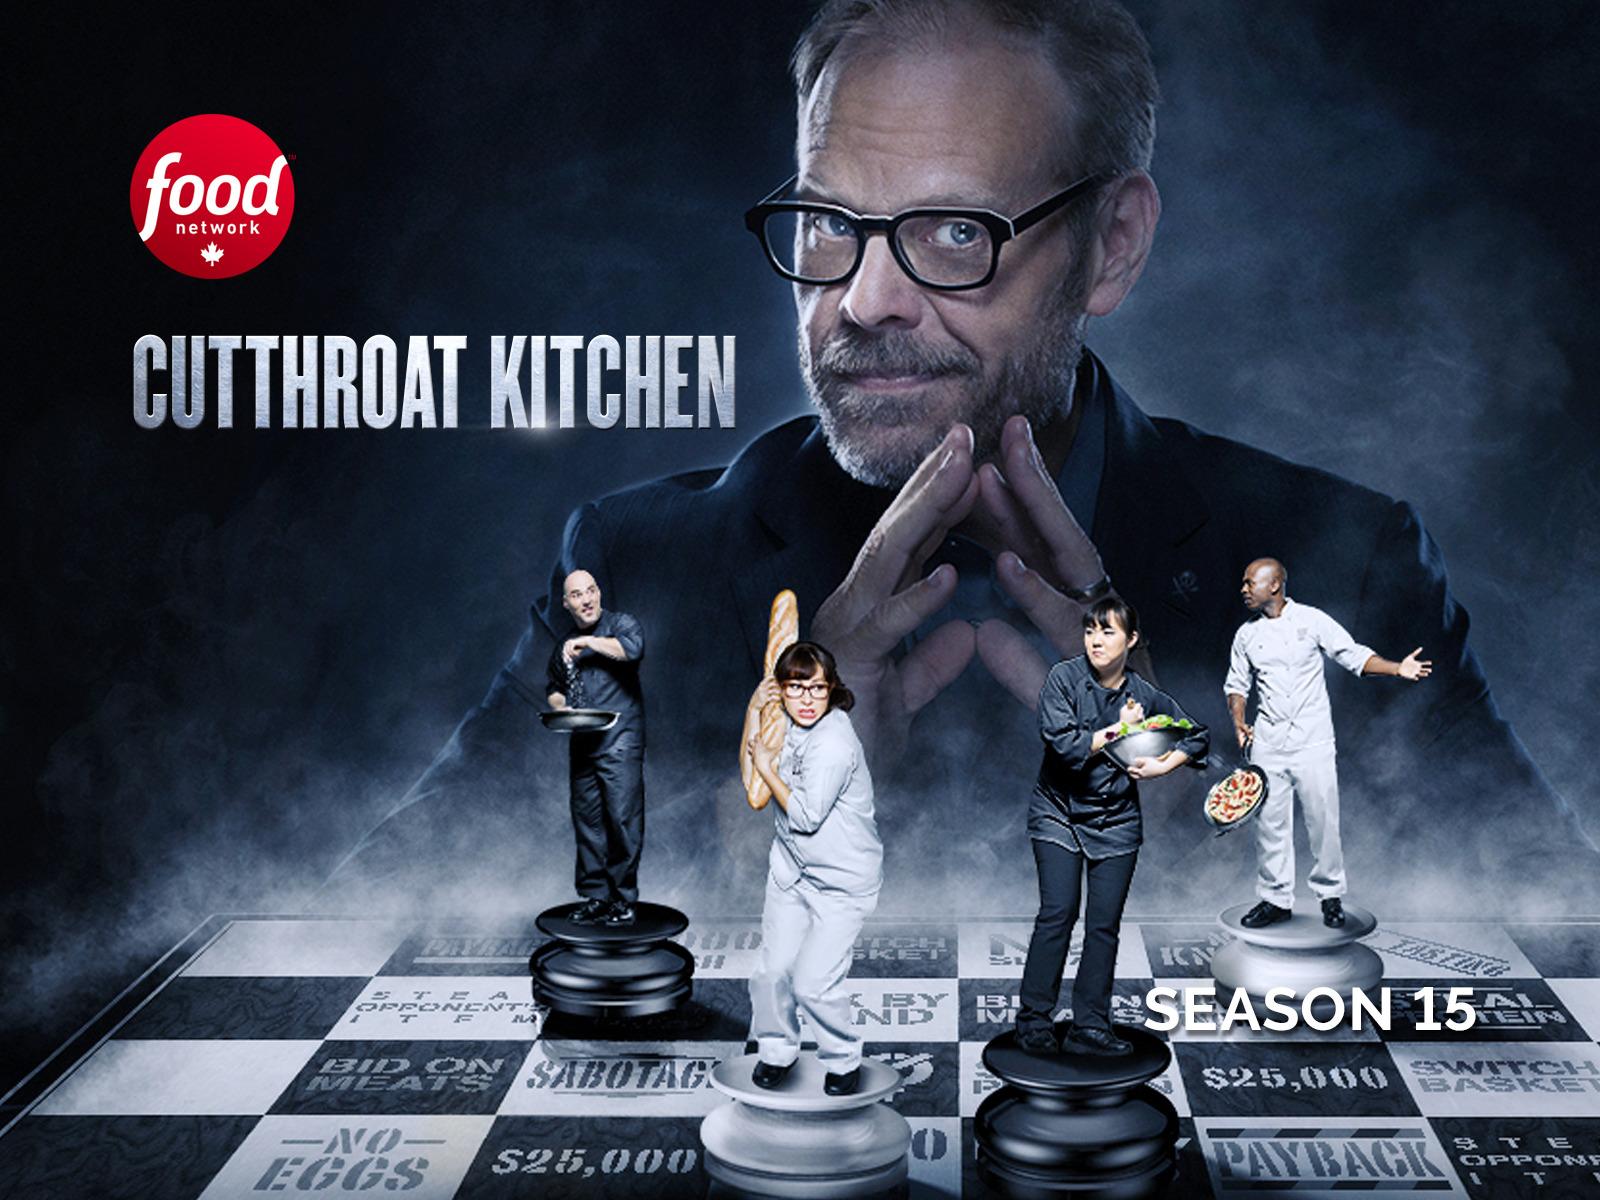 Prime Video Cutthroat Kitchen Season 15